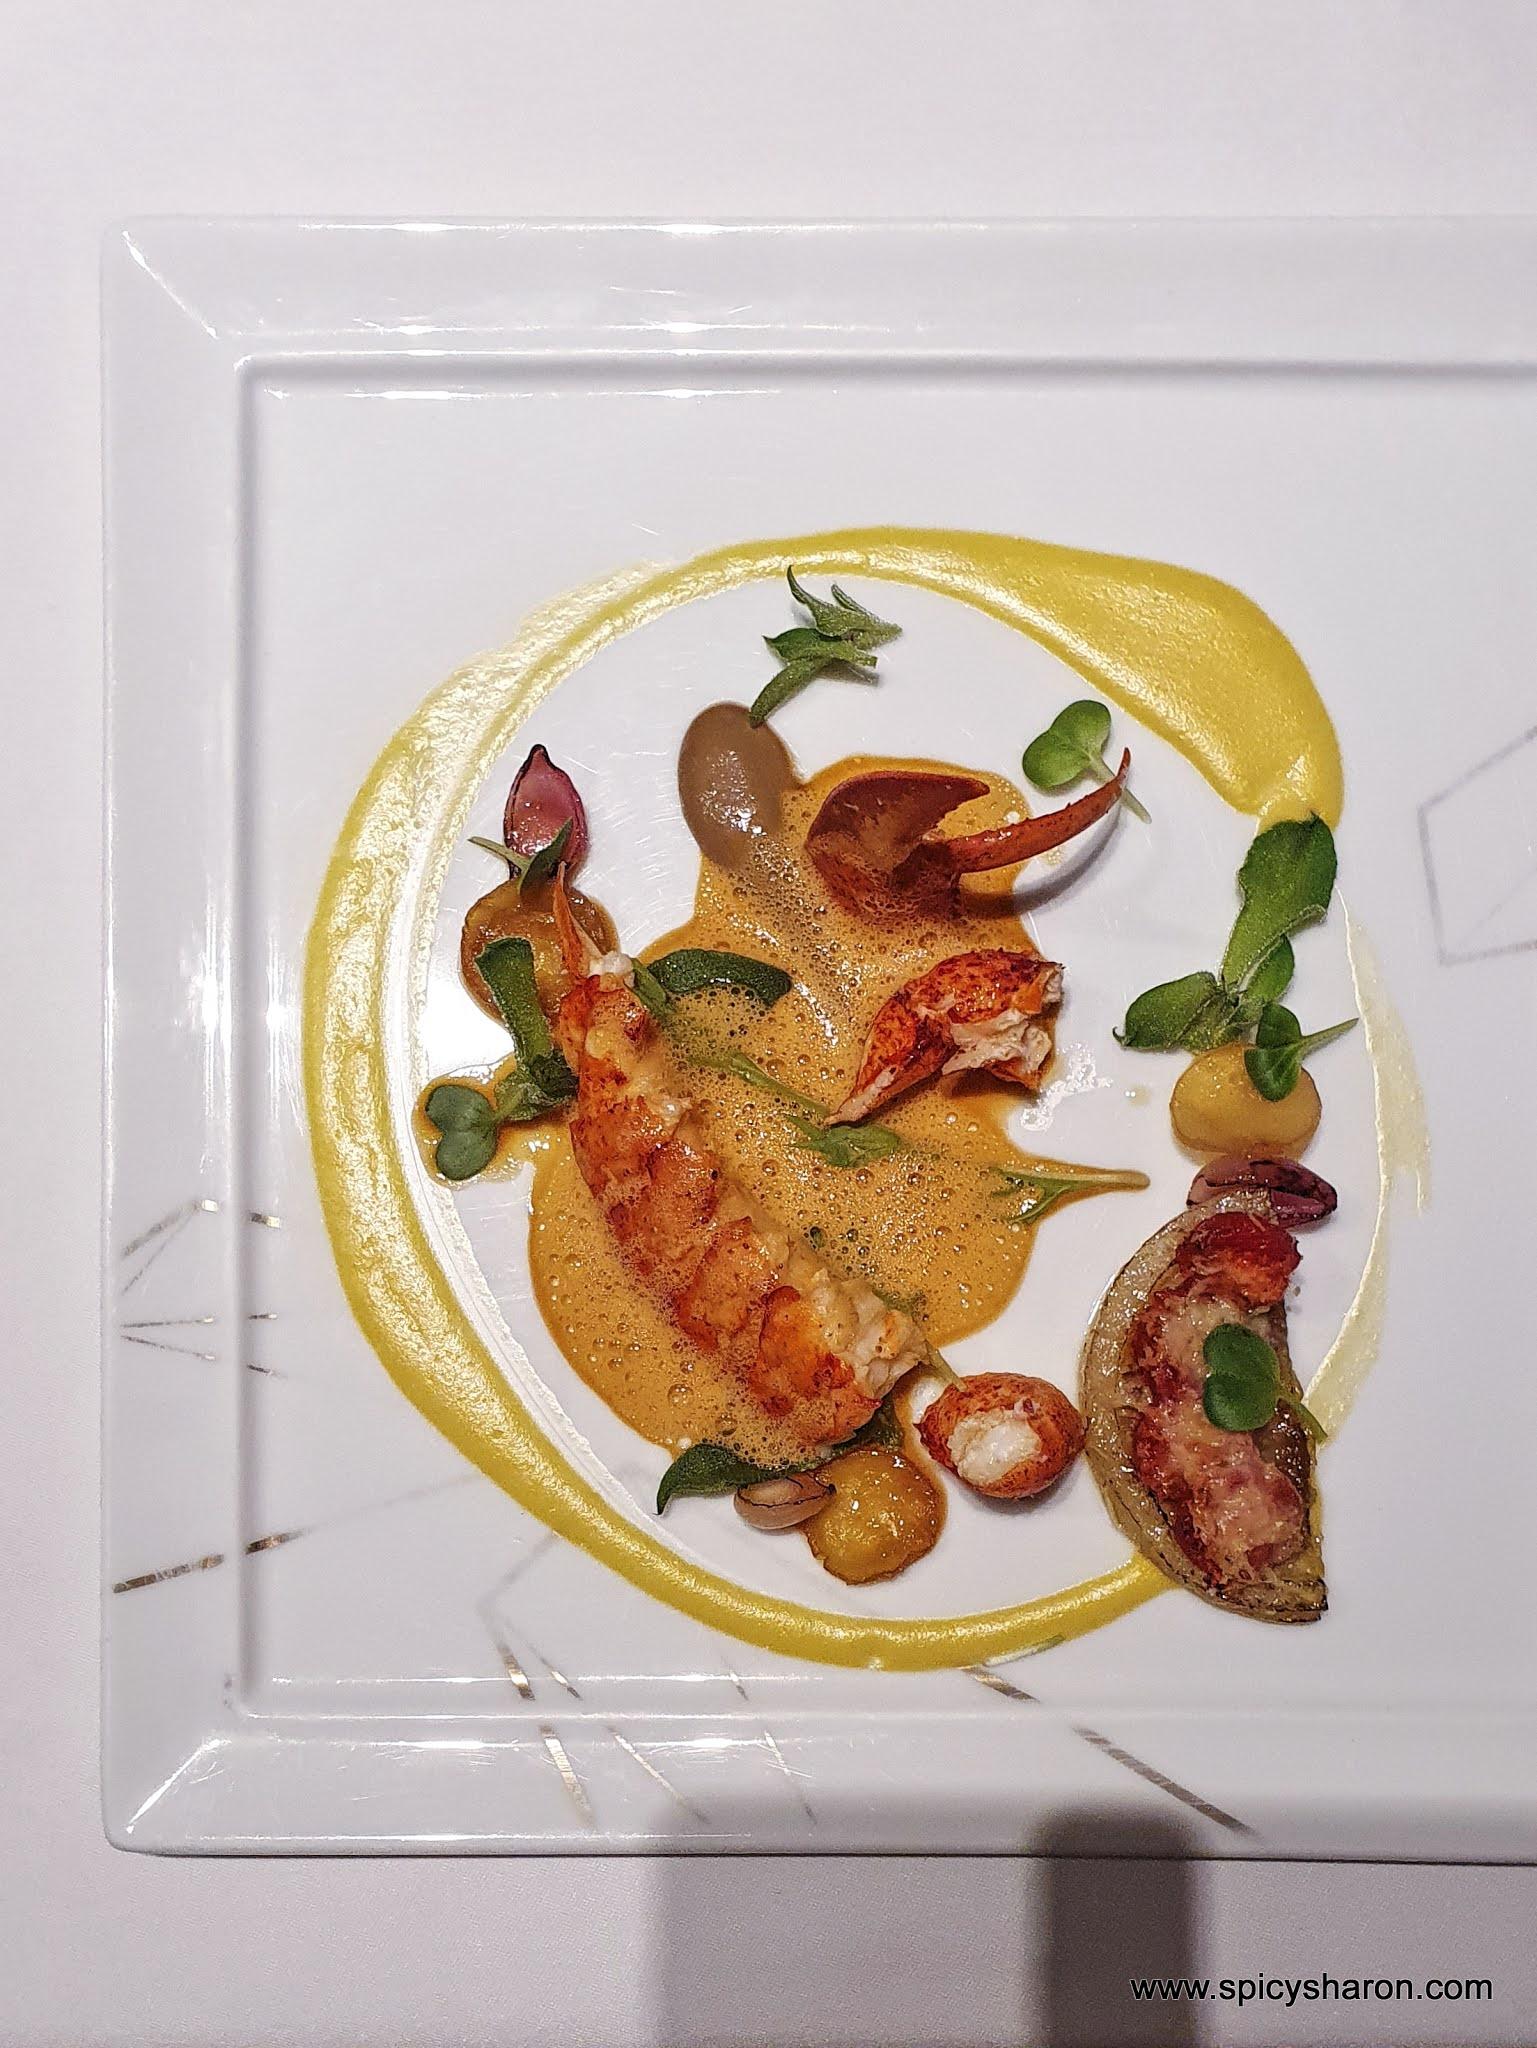 Best Fine Dining Restaurant In KL